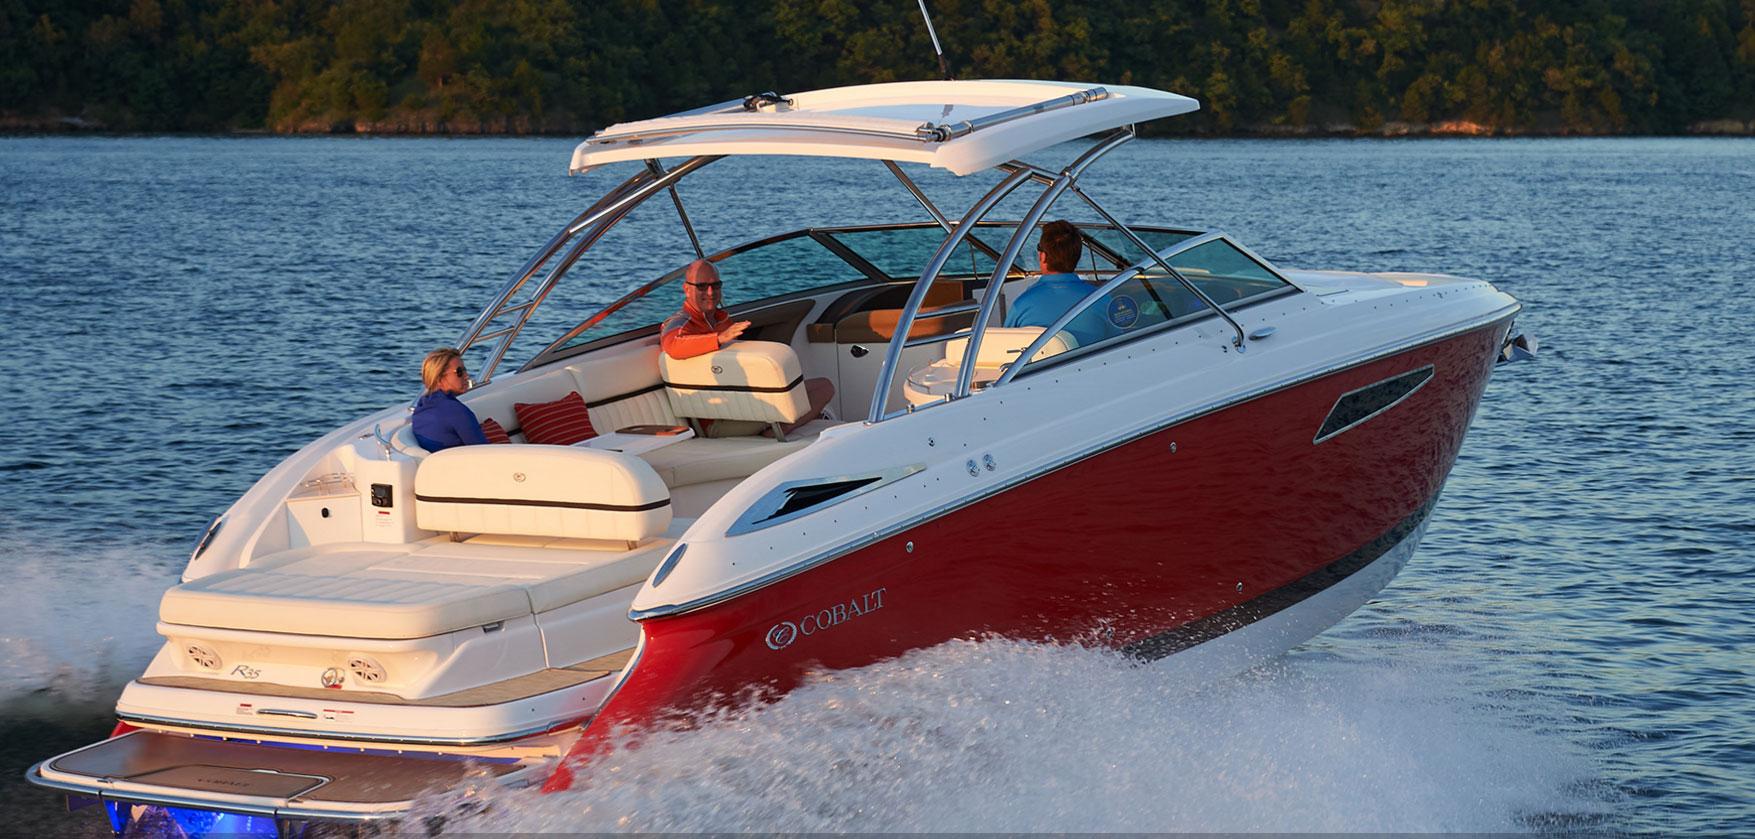 cobalt boats sureshade rh sureshade com Cobalt Deck Boat Cobalt Deck Boat